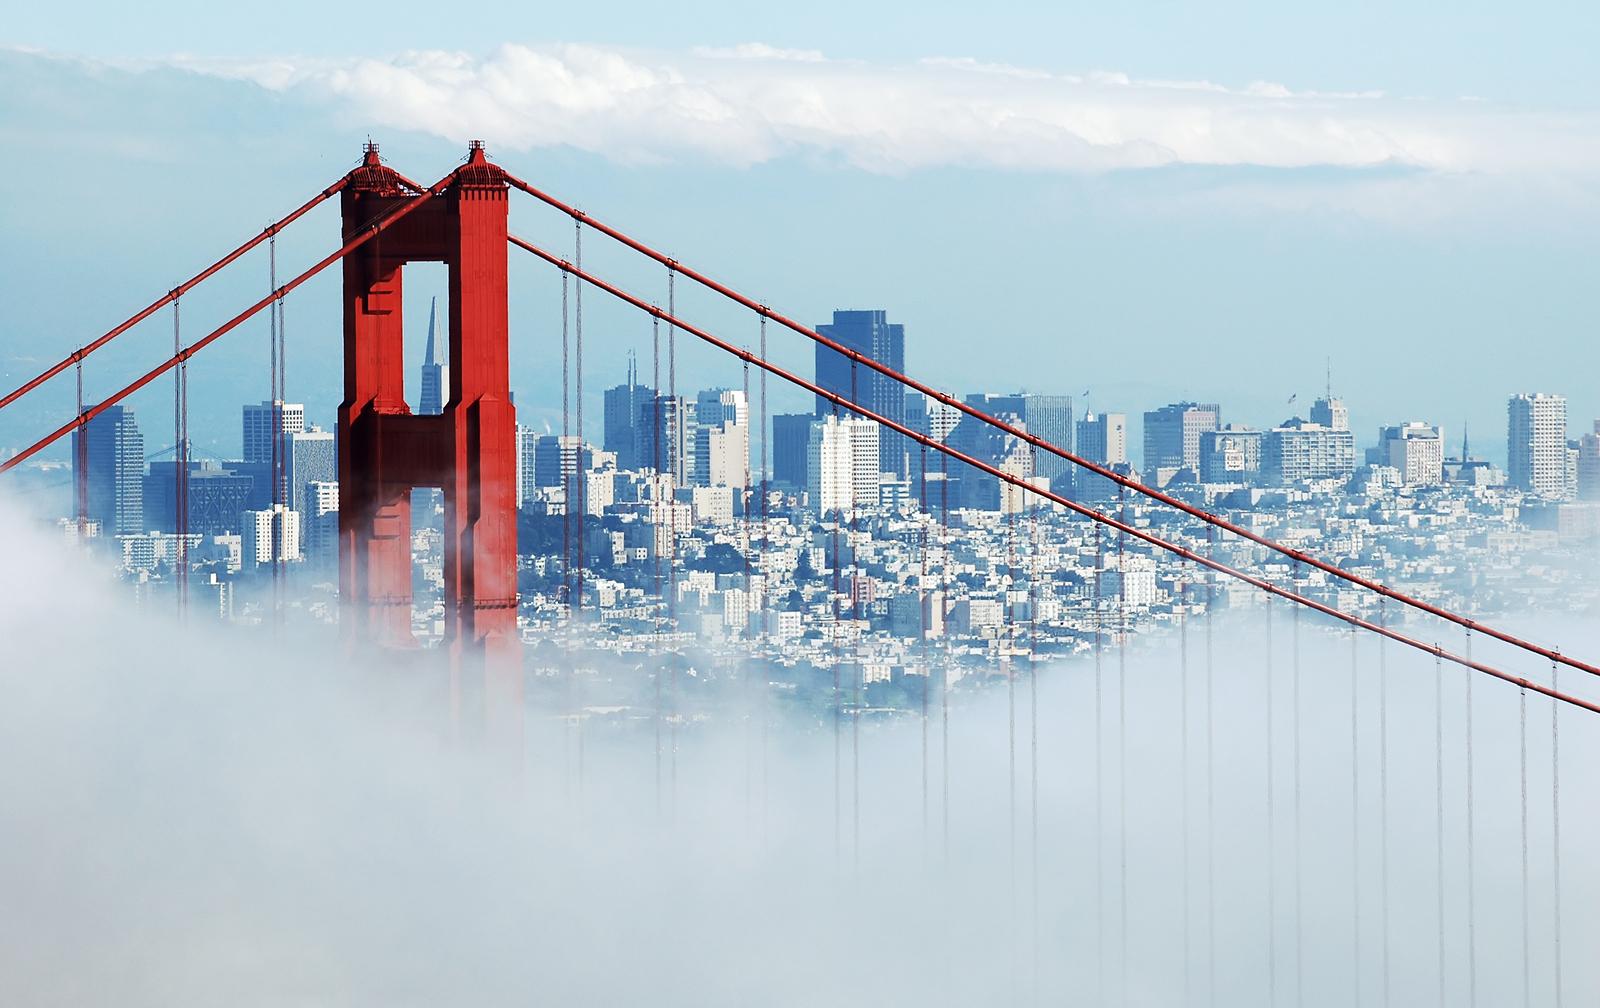 bigstock-Golden-Gate-Bridge-San-Franci-1374516(1).jpg